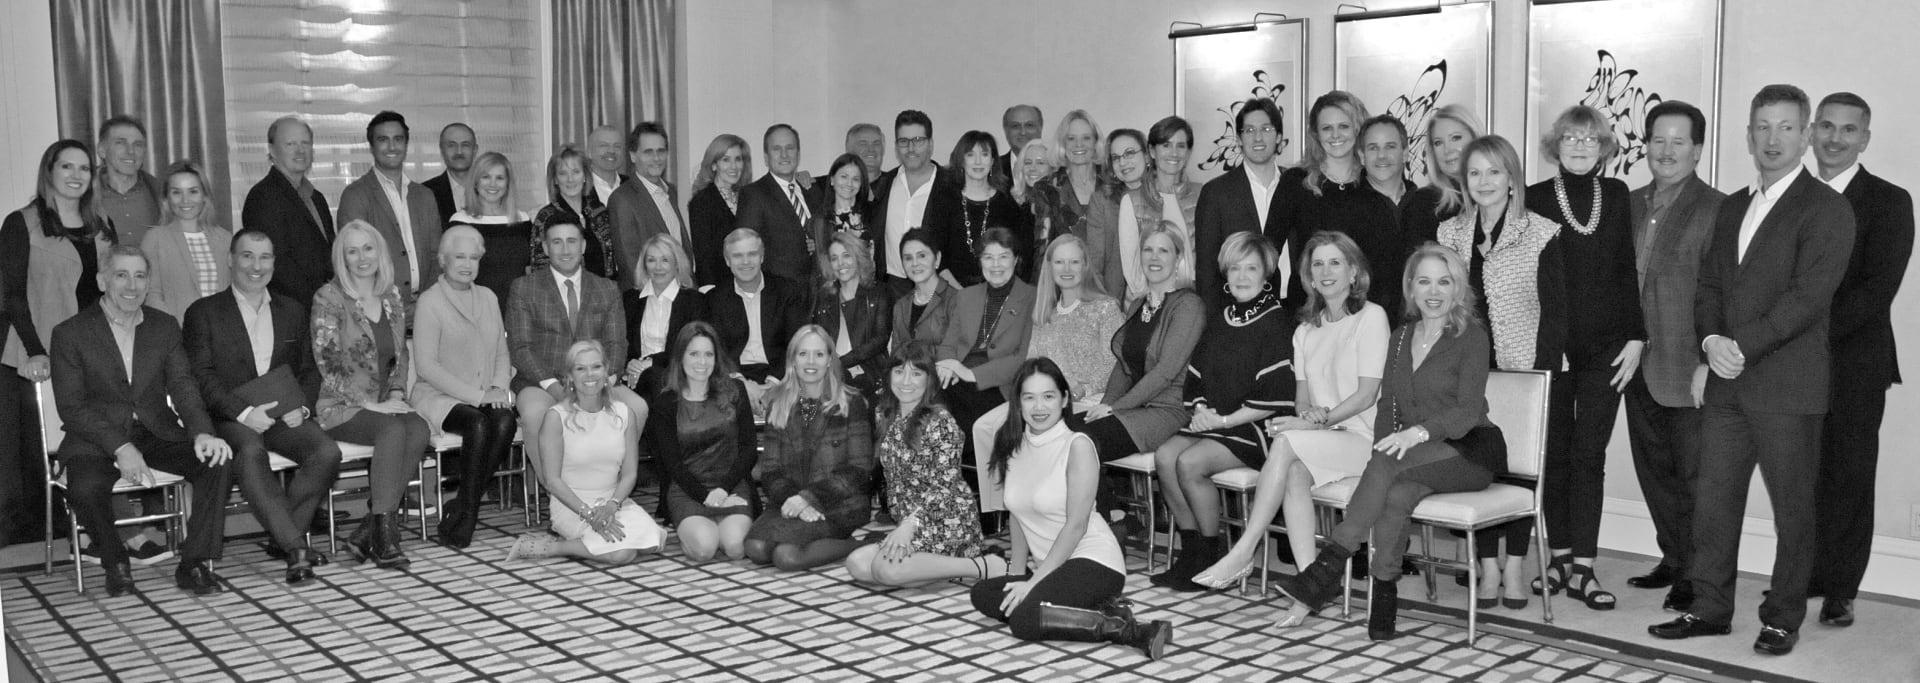 Tim Elmes Attends Prestigious International Luxury Alliance Event